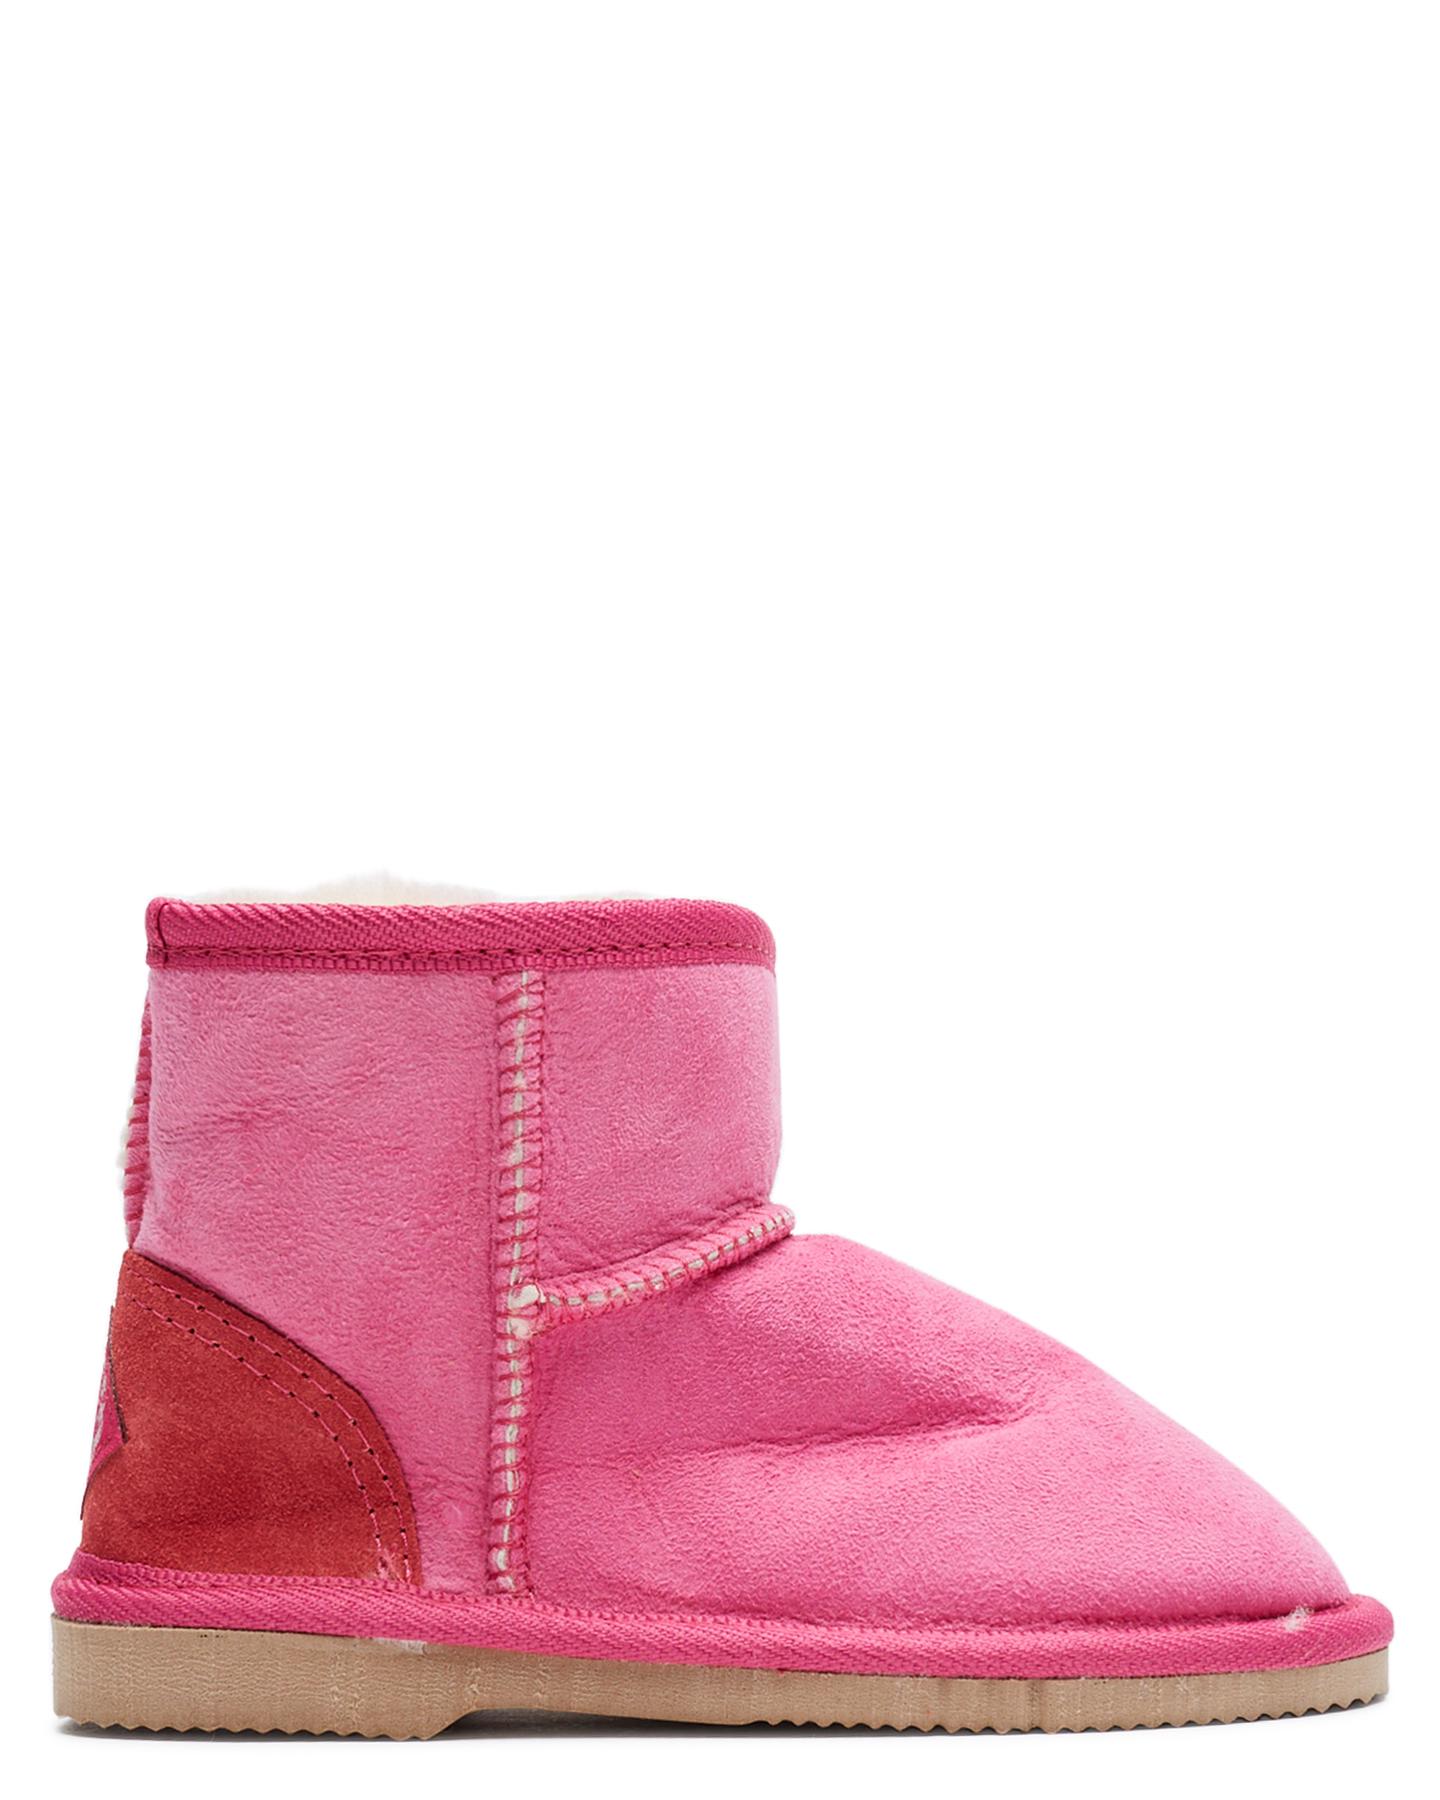 Ugg Australia Girls Mini Ugg Boot - Youth Pink